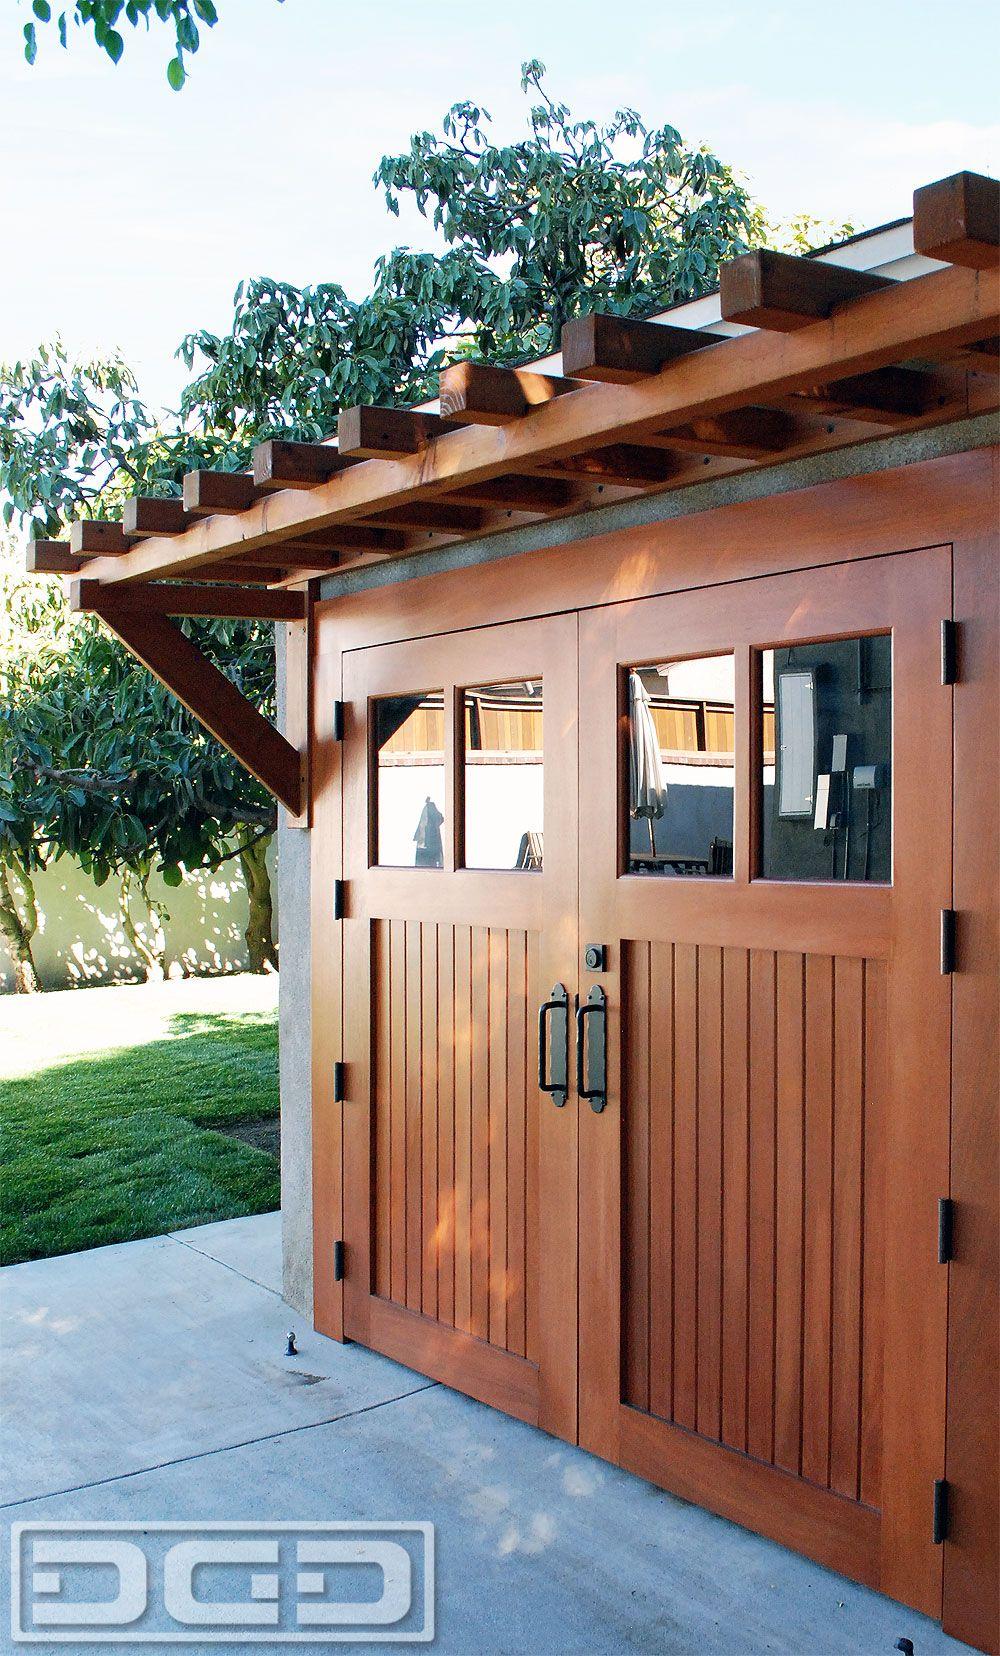 Trellis over garage door - Adding A Pergola Helps Dress Up A Garage Door Entry And Adds An Elegant Canopy Over Your Garage Door Trellises Support Vine Growth On Either Sid